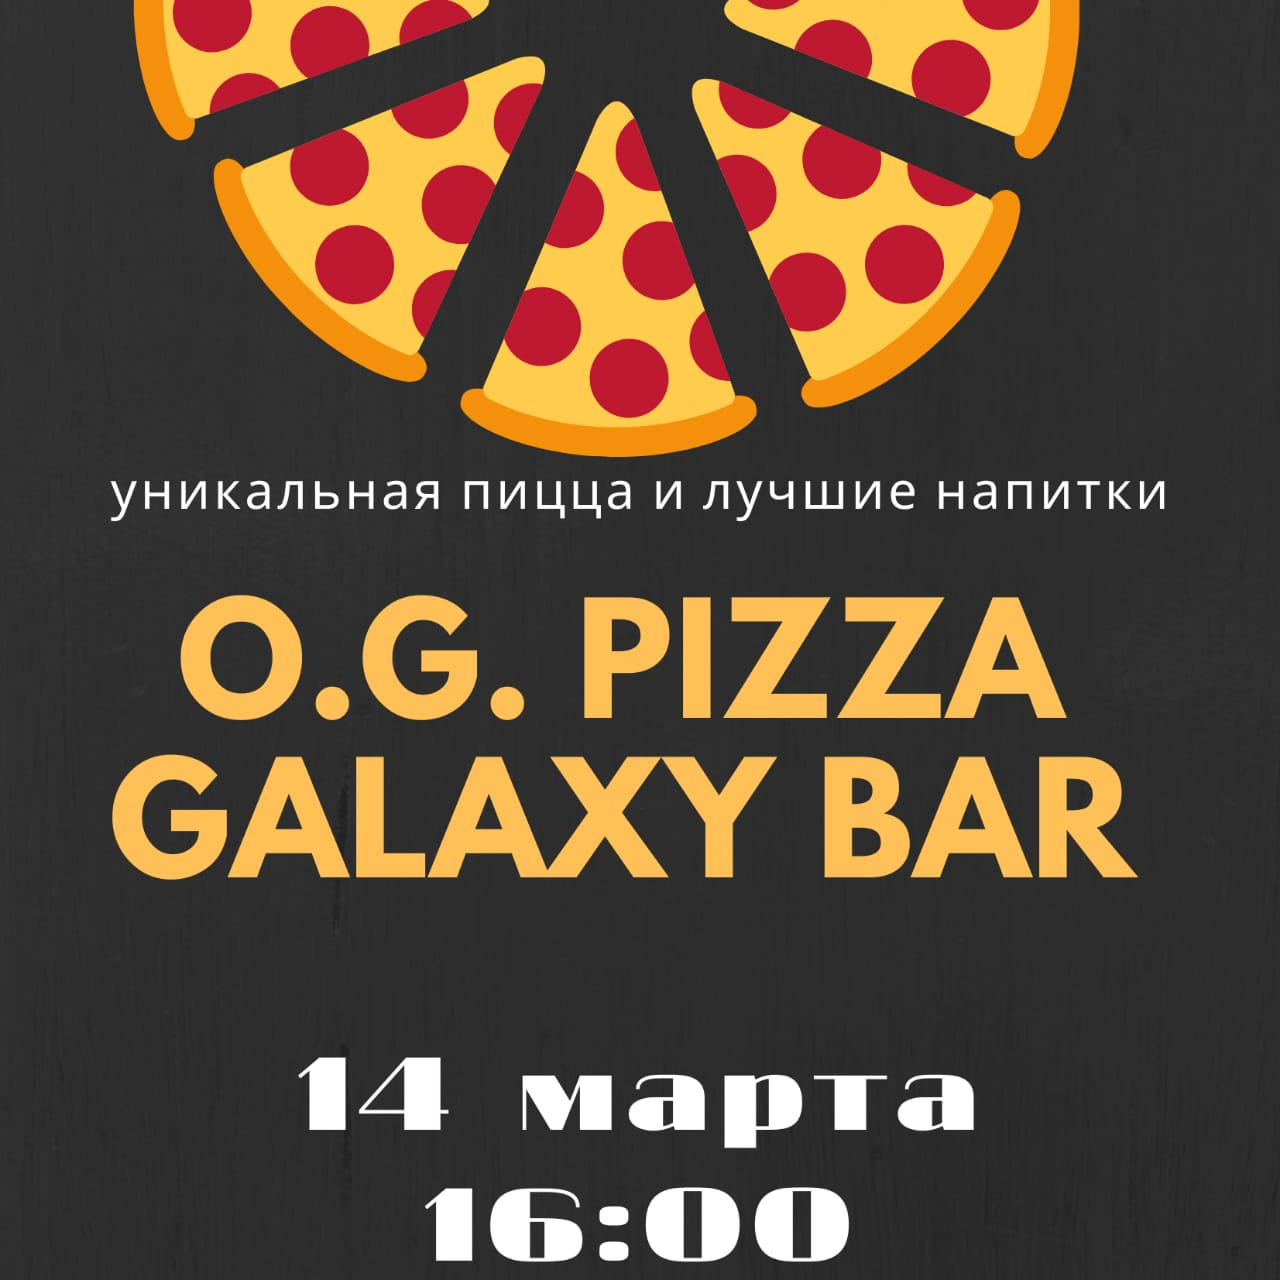 O.G.Pizza в Galaxy bar! 14 марта!